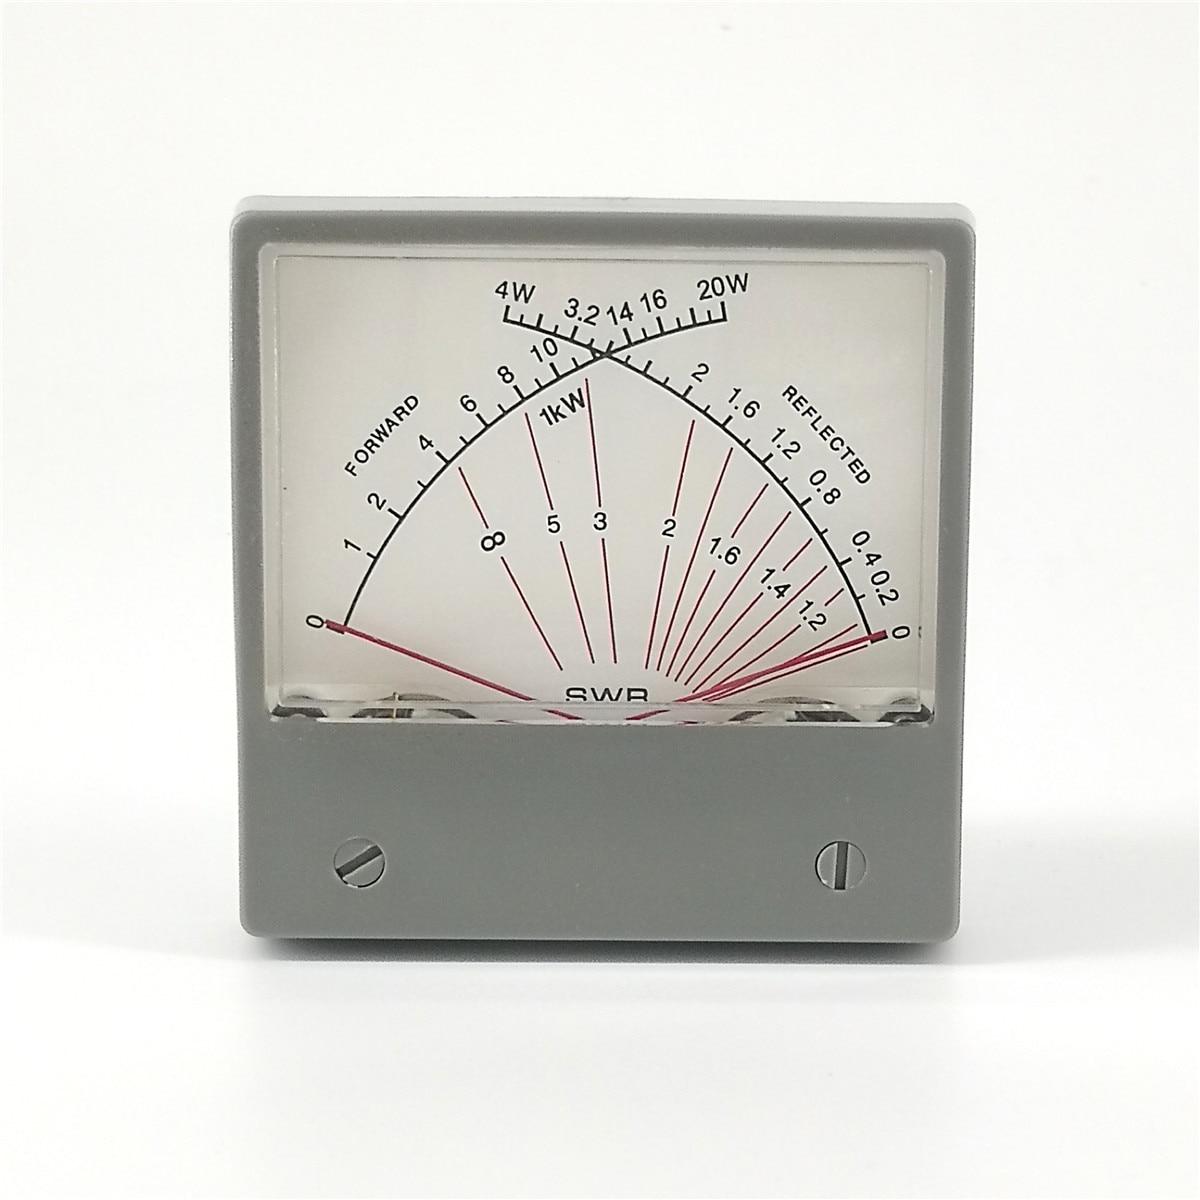 Dual-Meter Radio Ratio-Forwad-Swr-Meter Wave Stationary SZ-70-1 Reflected HF 4W Forward